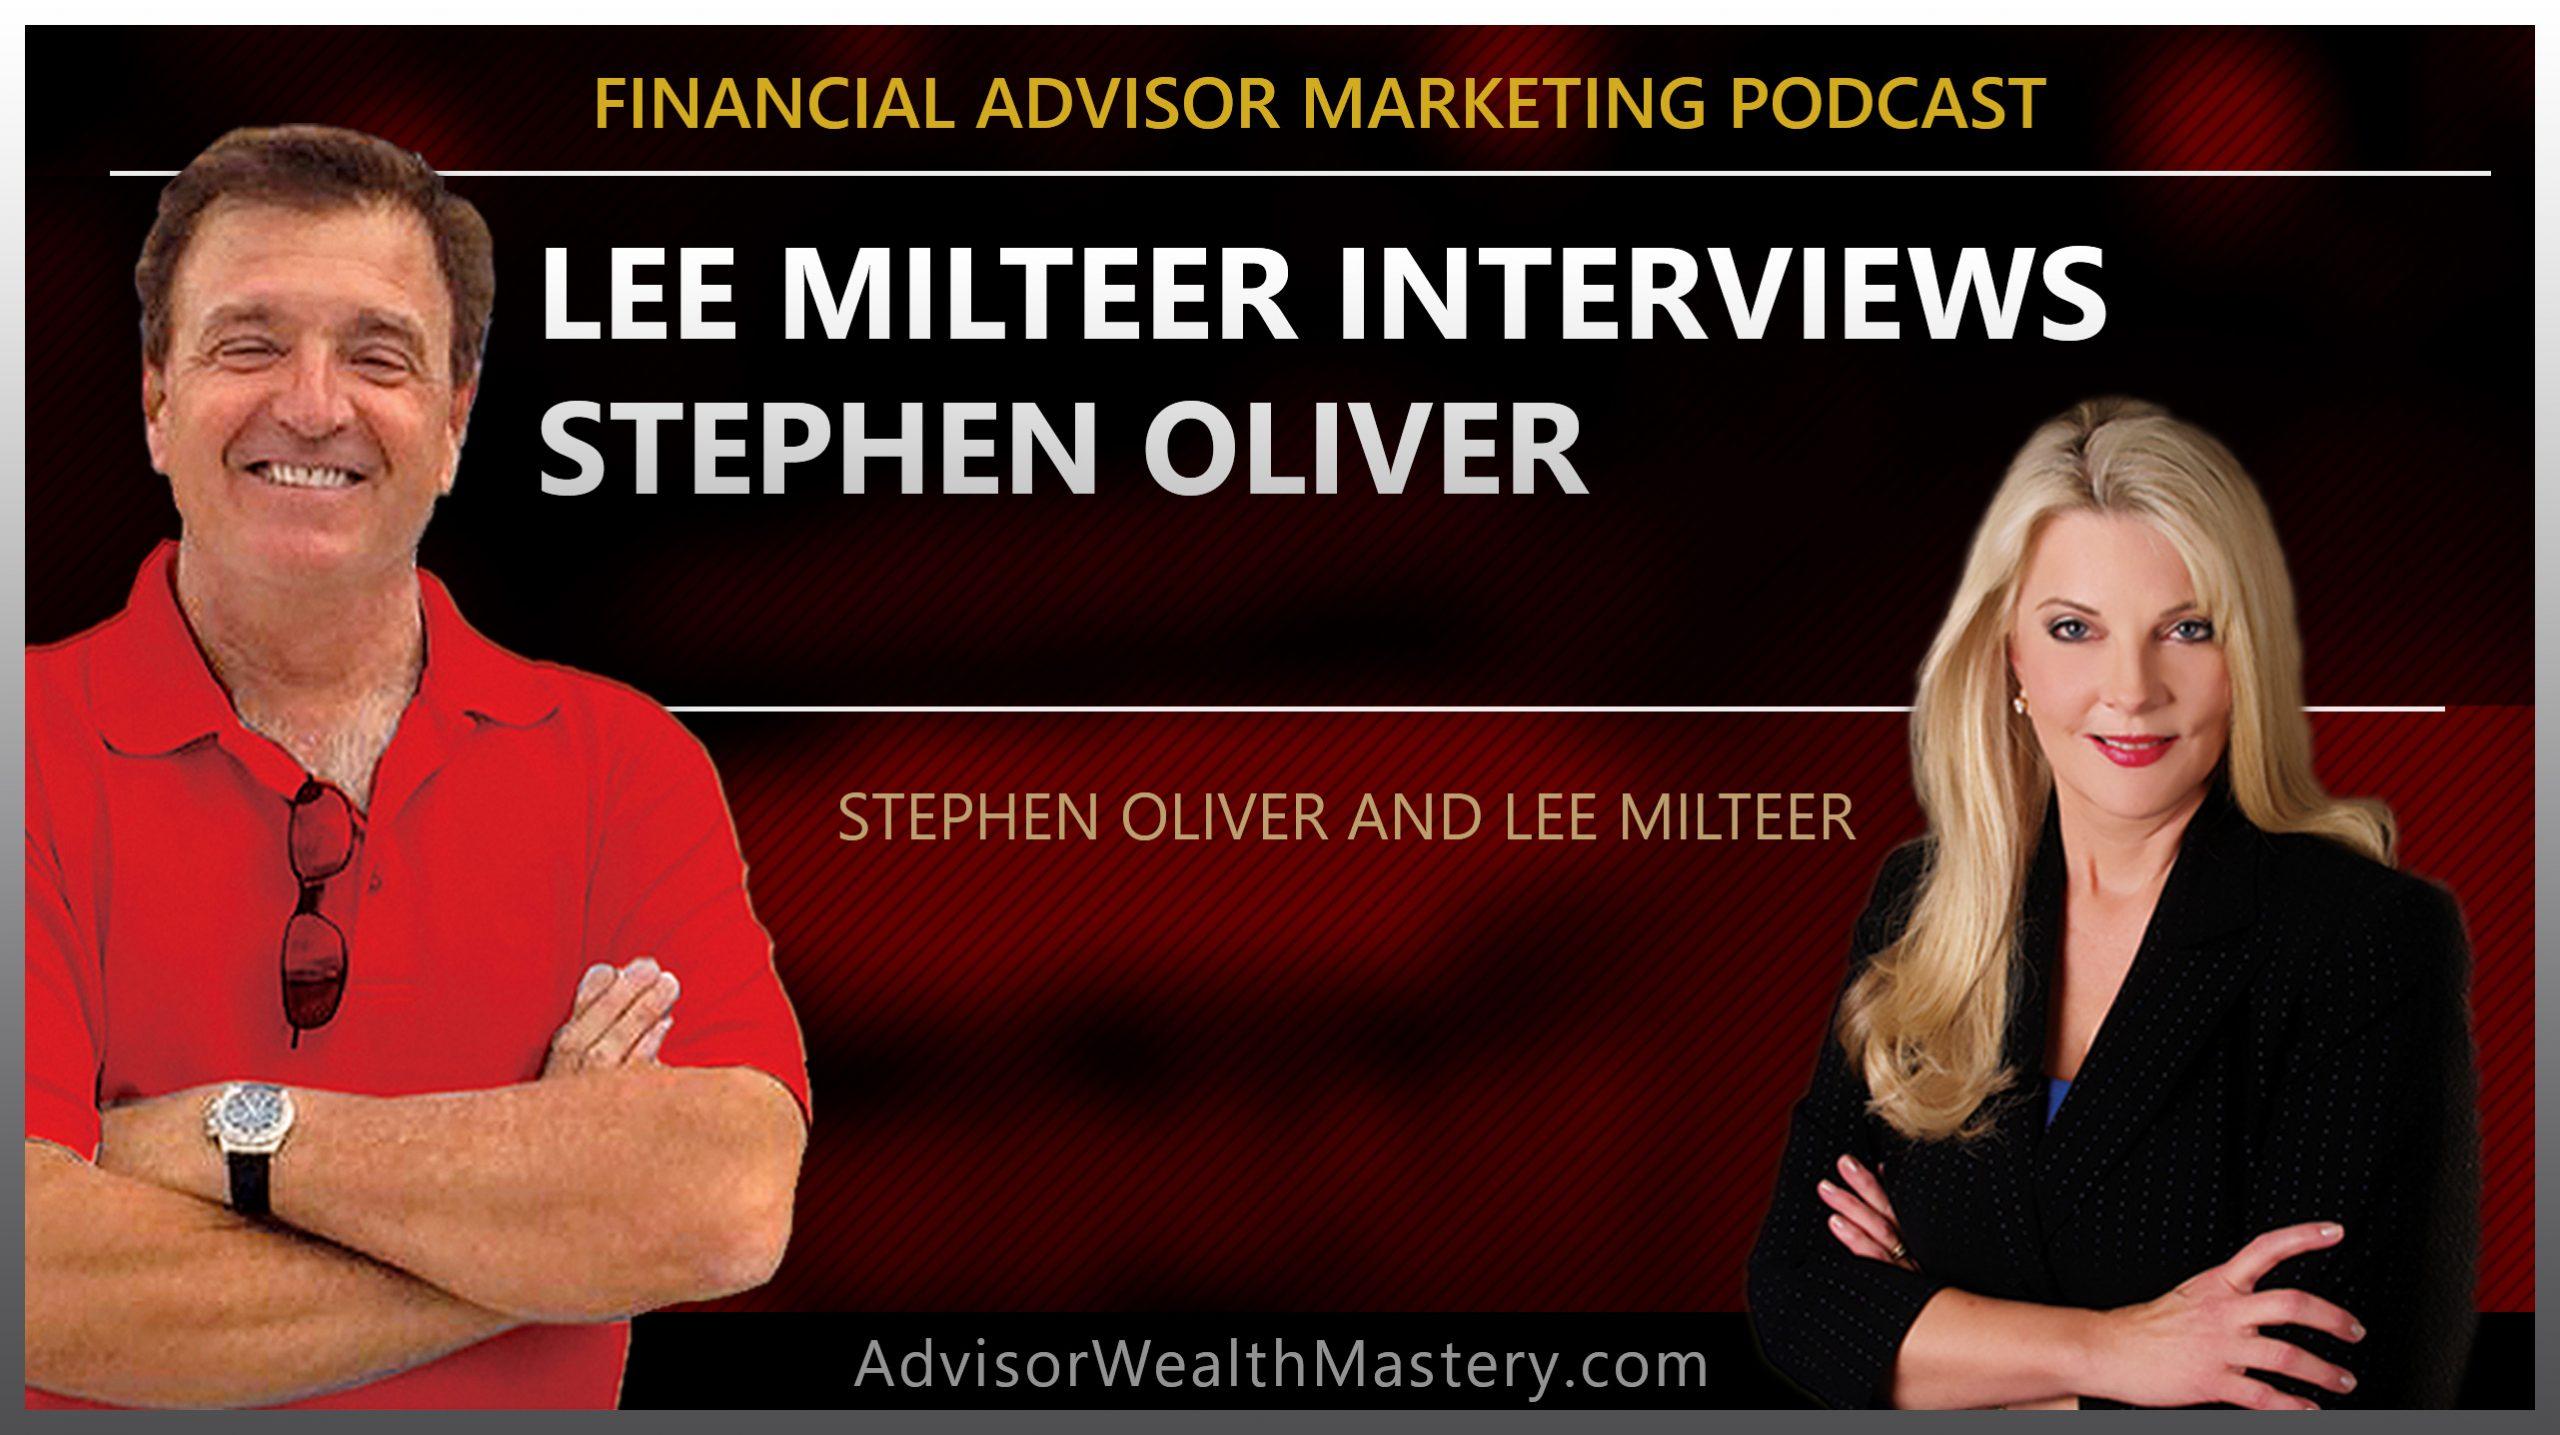 Lee Milteer Interviews Stephen Oliver